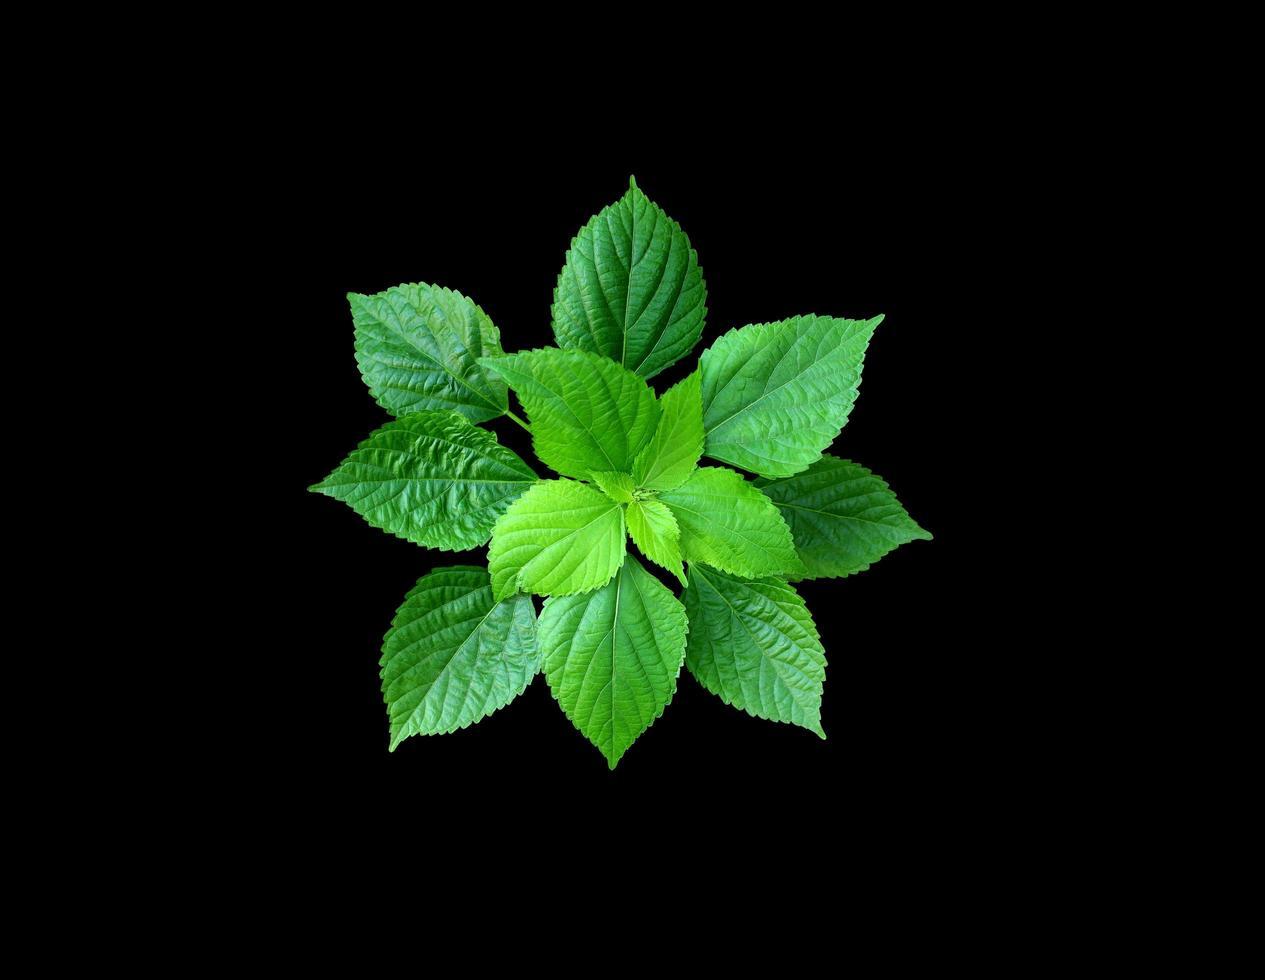 gröna blad på svart foto